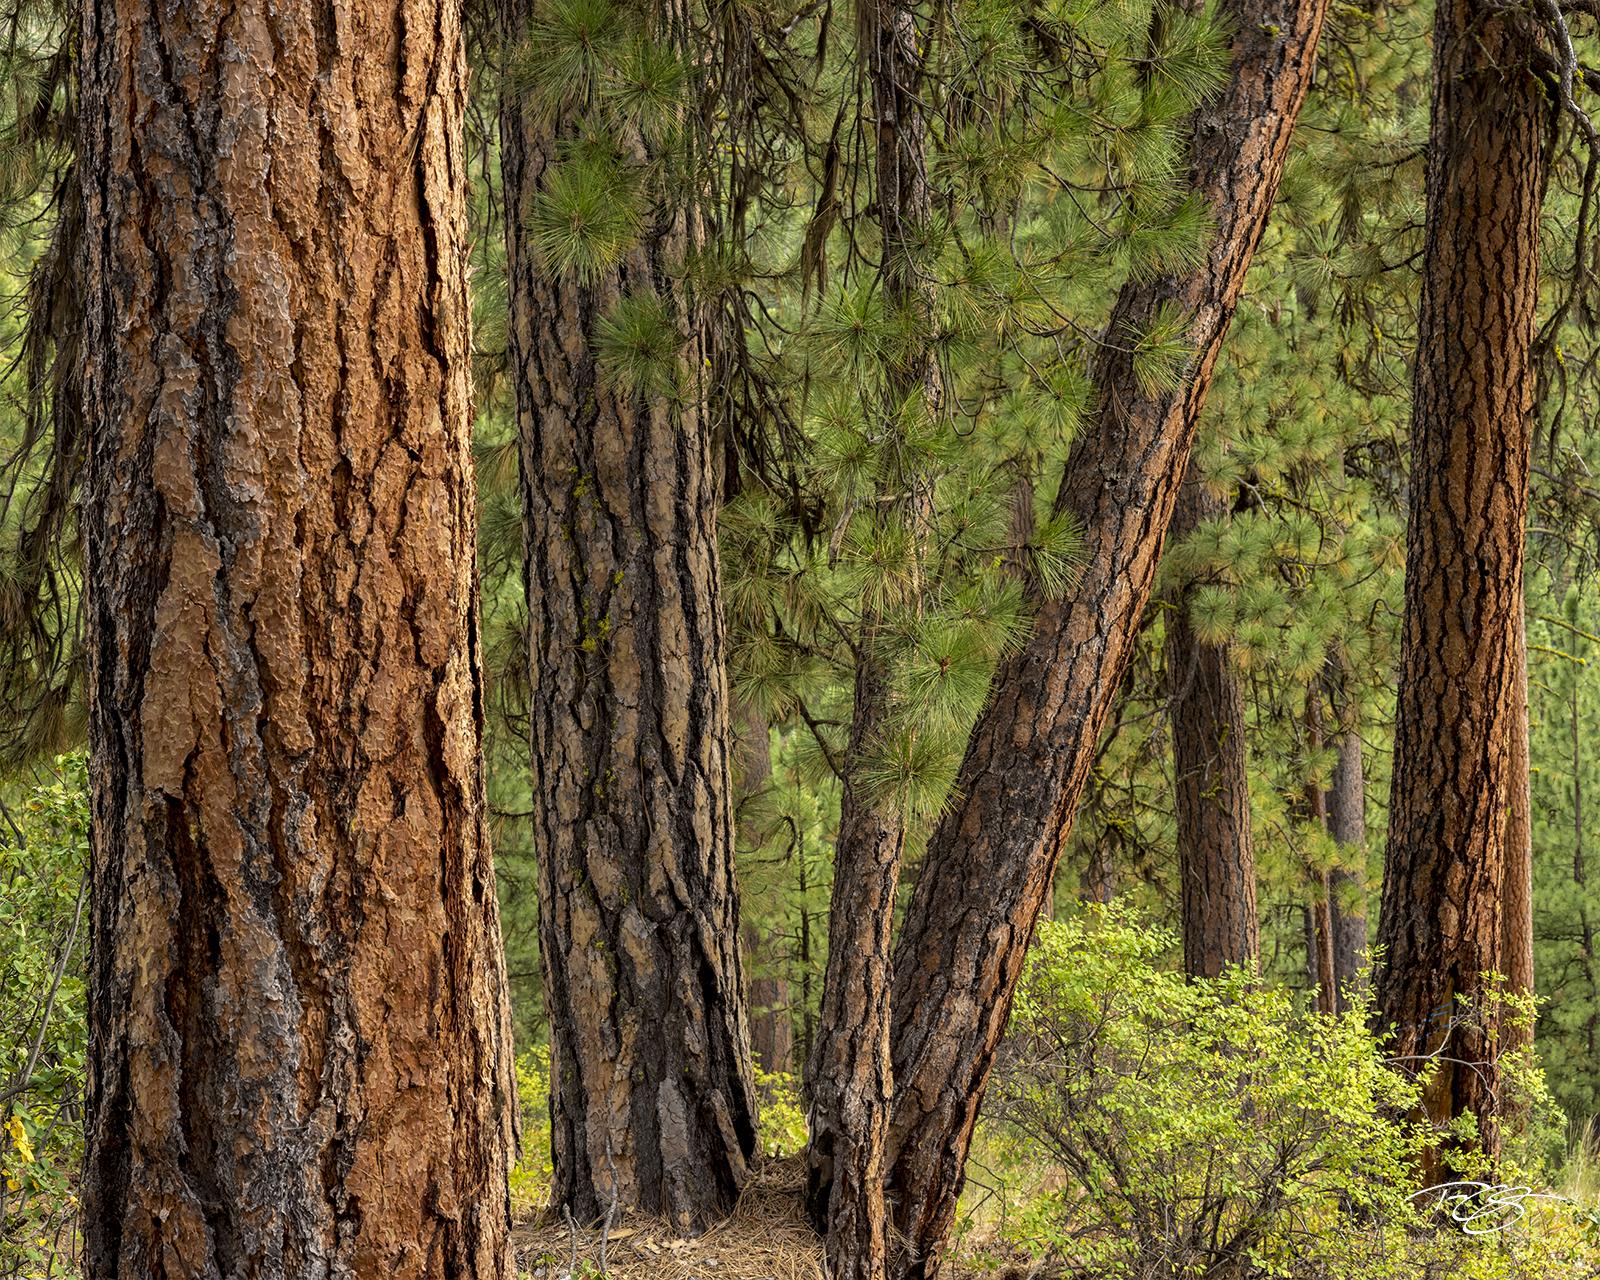 trees, forest, pines, evergreens, ponderosa pine, ponderosas bark, green, red, brown, earth tone, idaho, arizona, colorado, photo